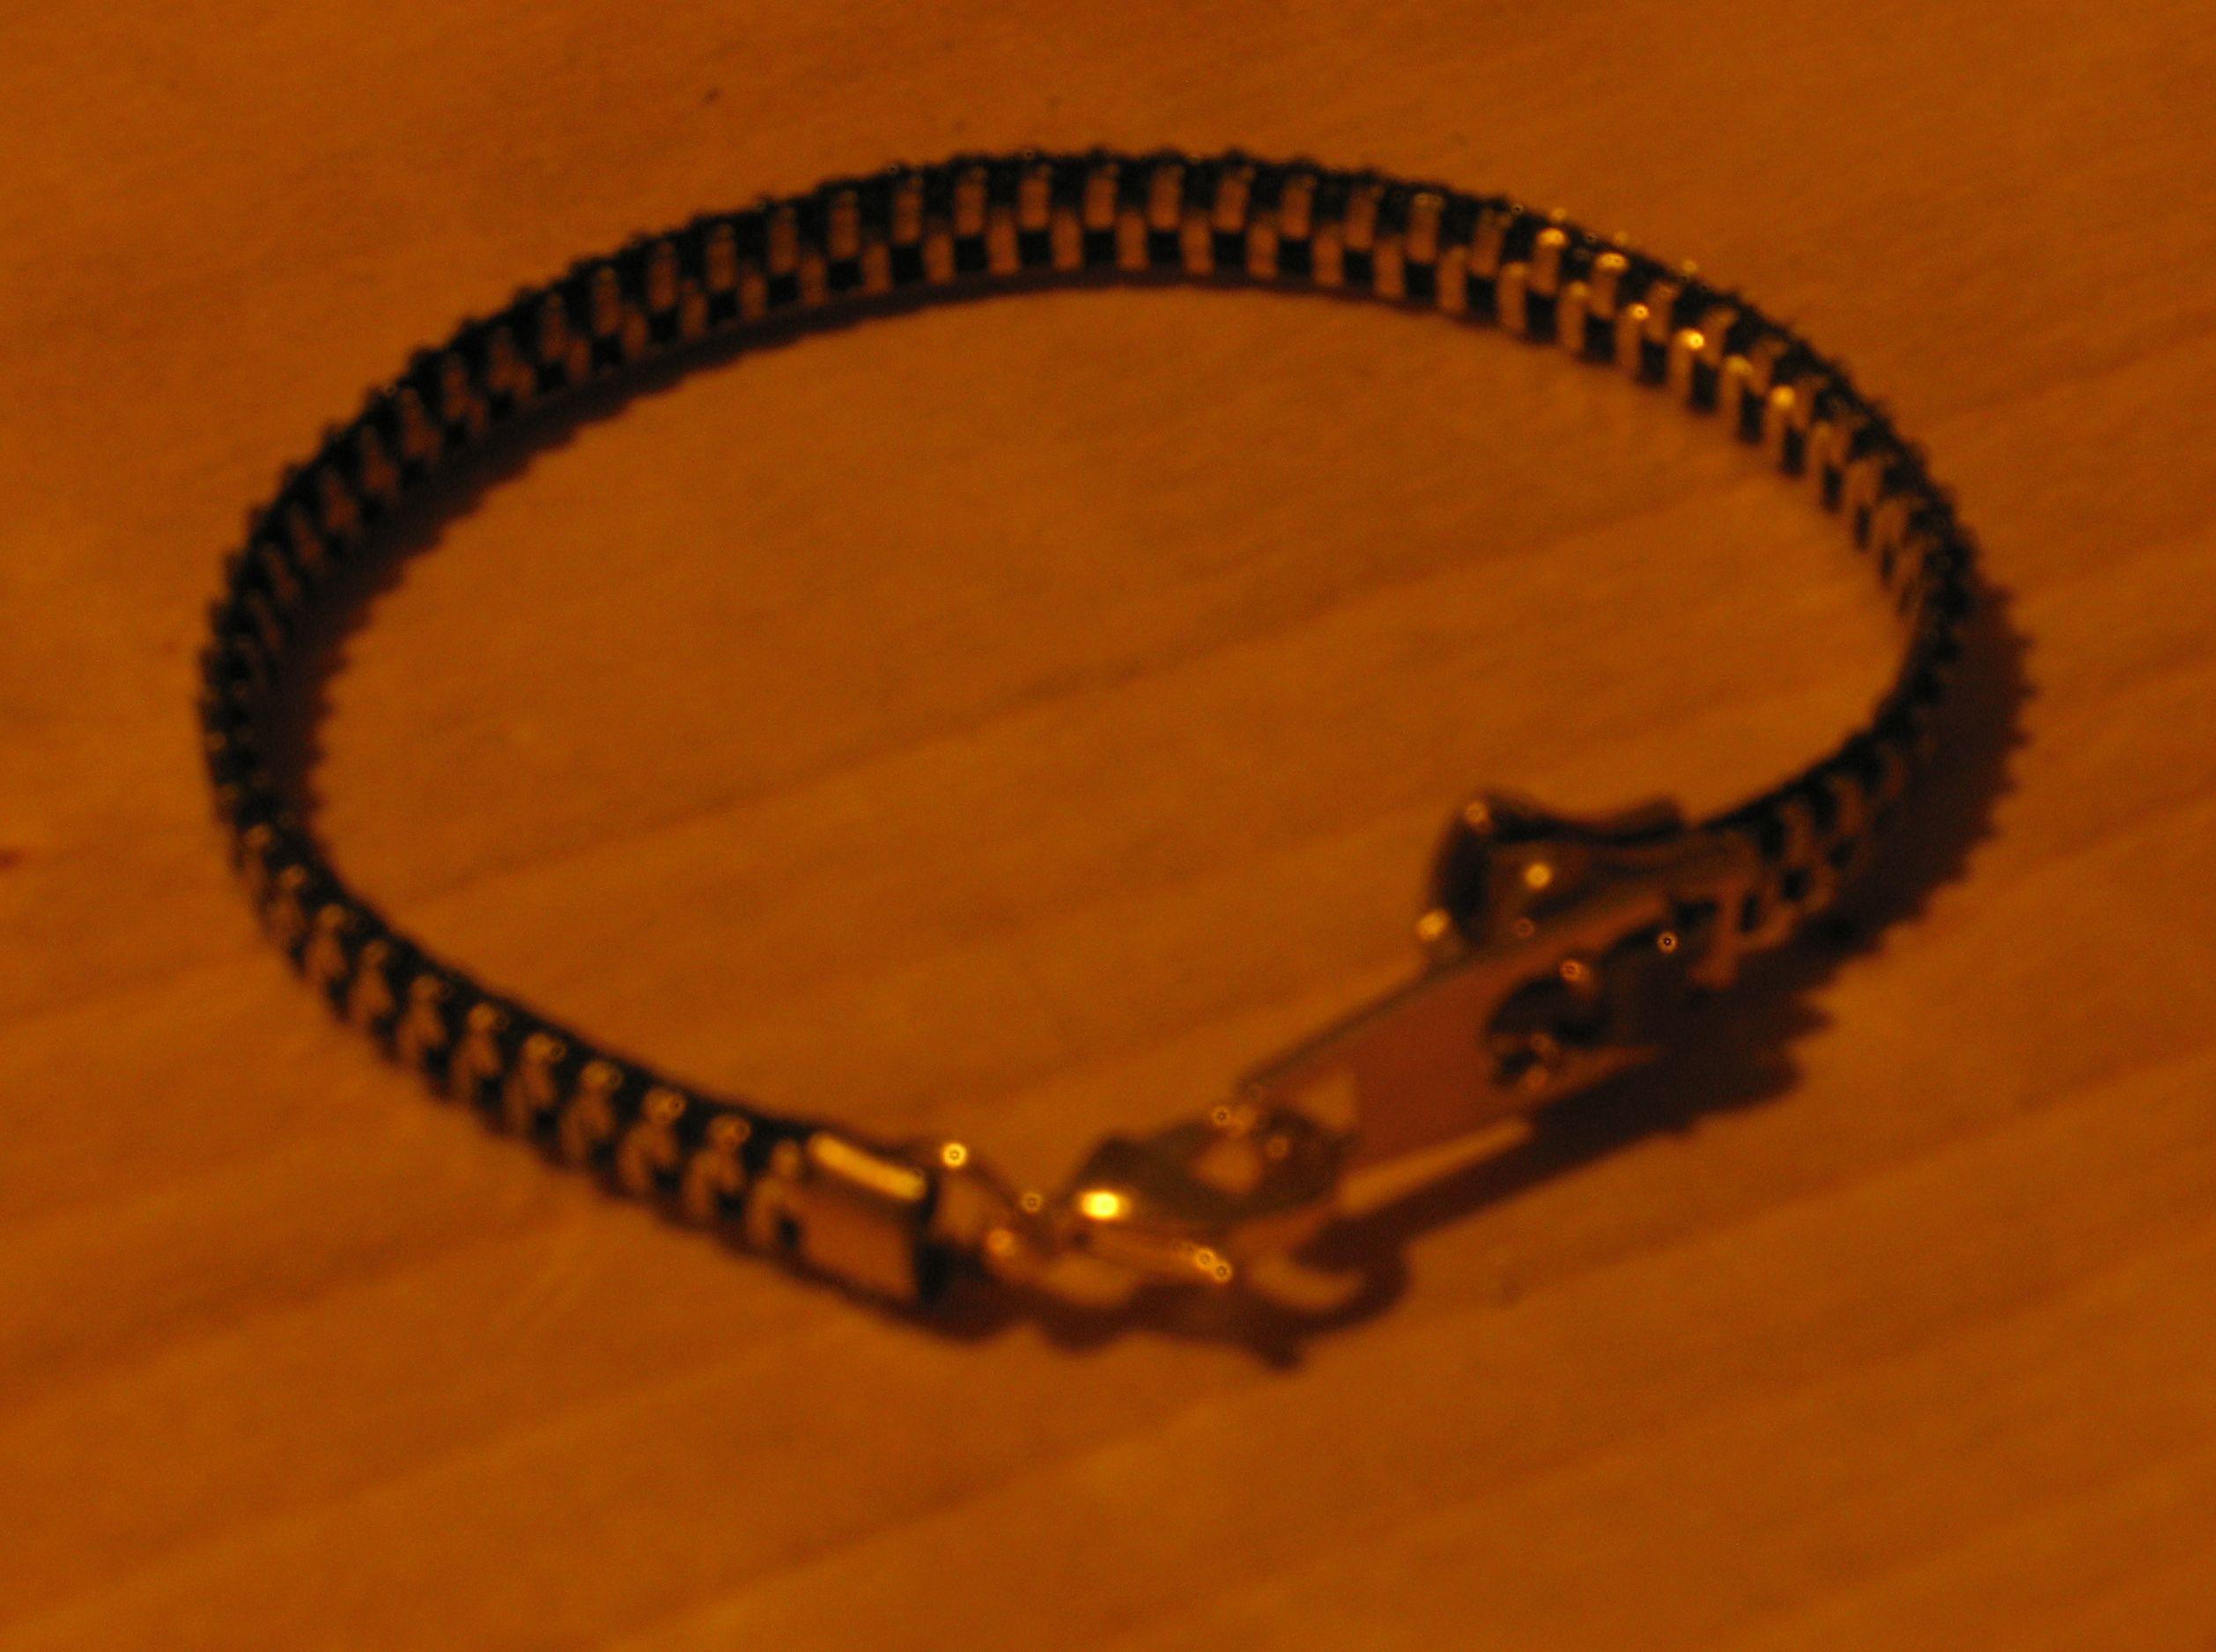 Zipper bracelet - cute!